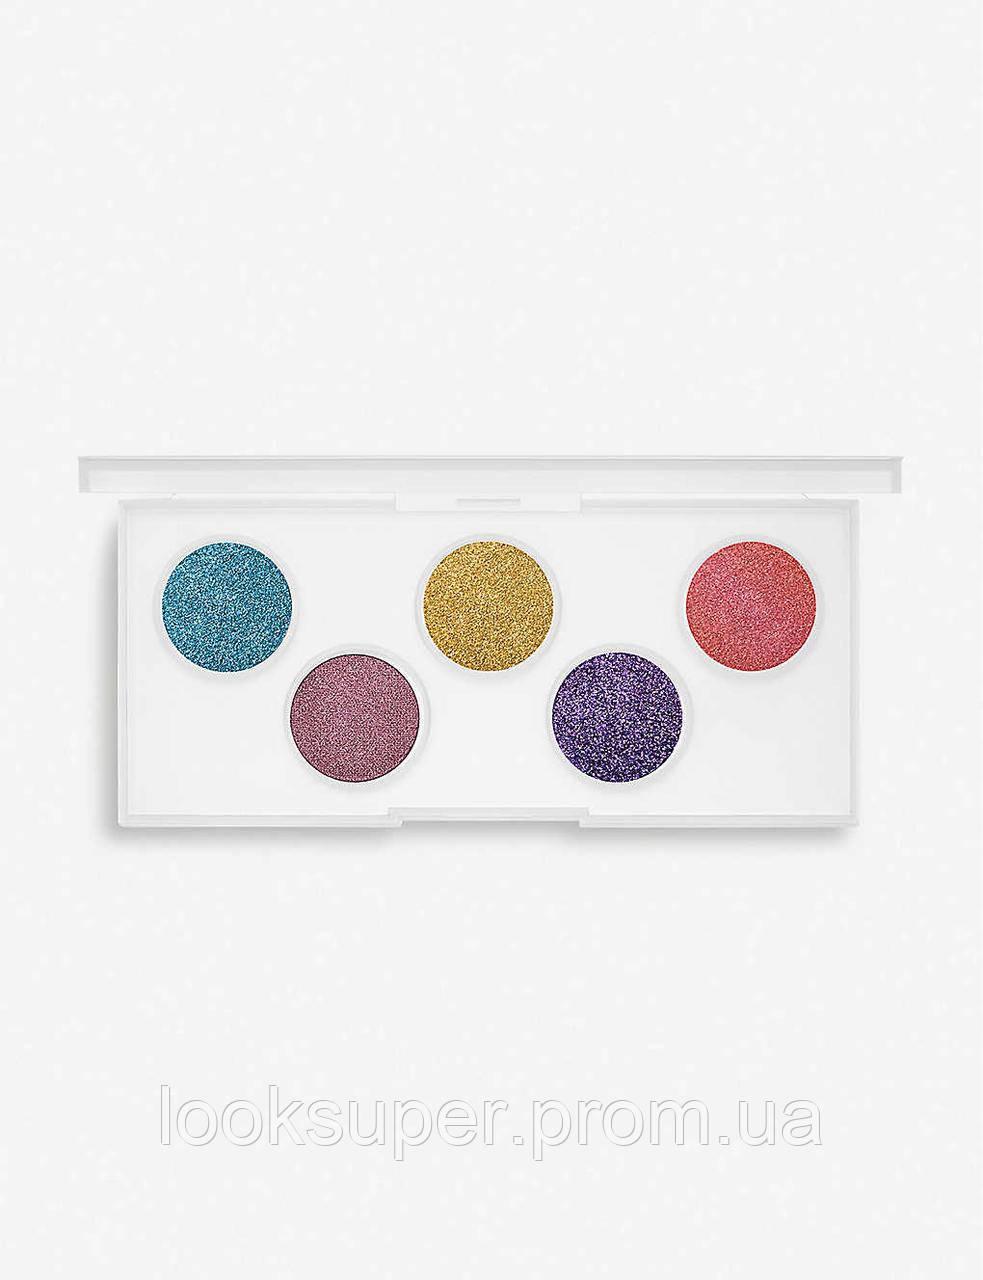 Палетка Pat McGrath Labs Subversive eyeshadow palette